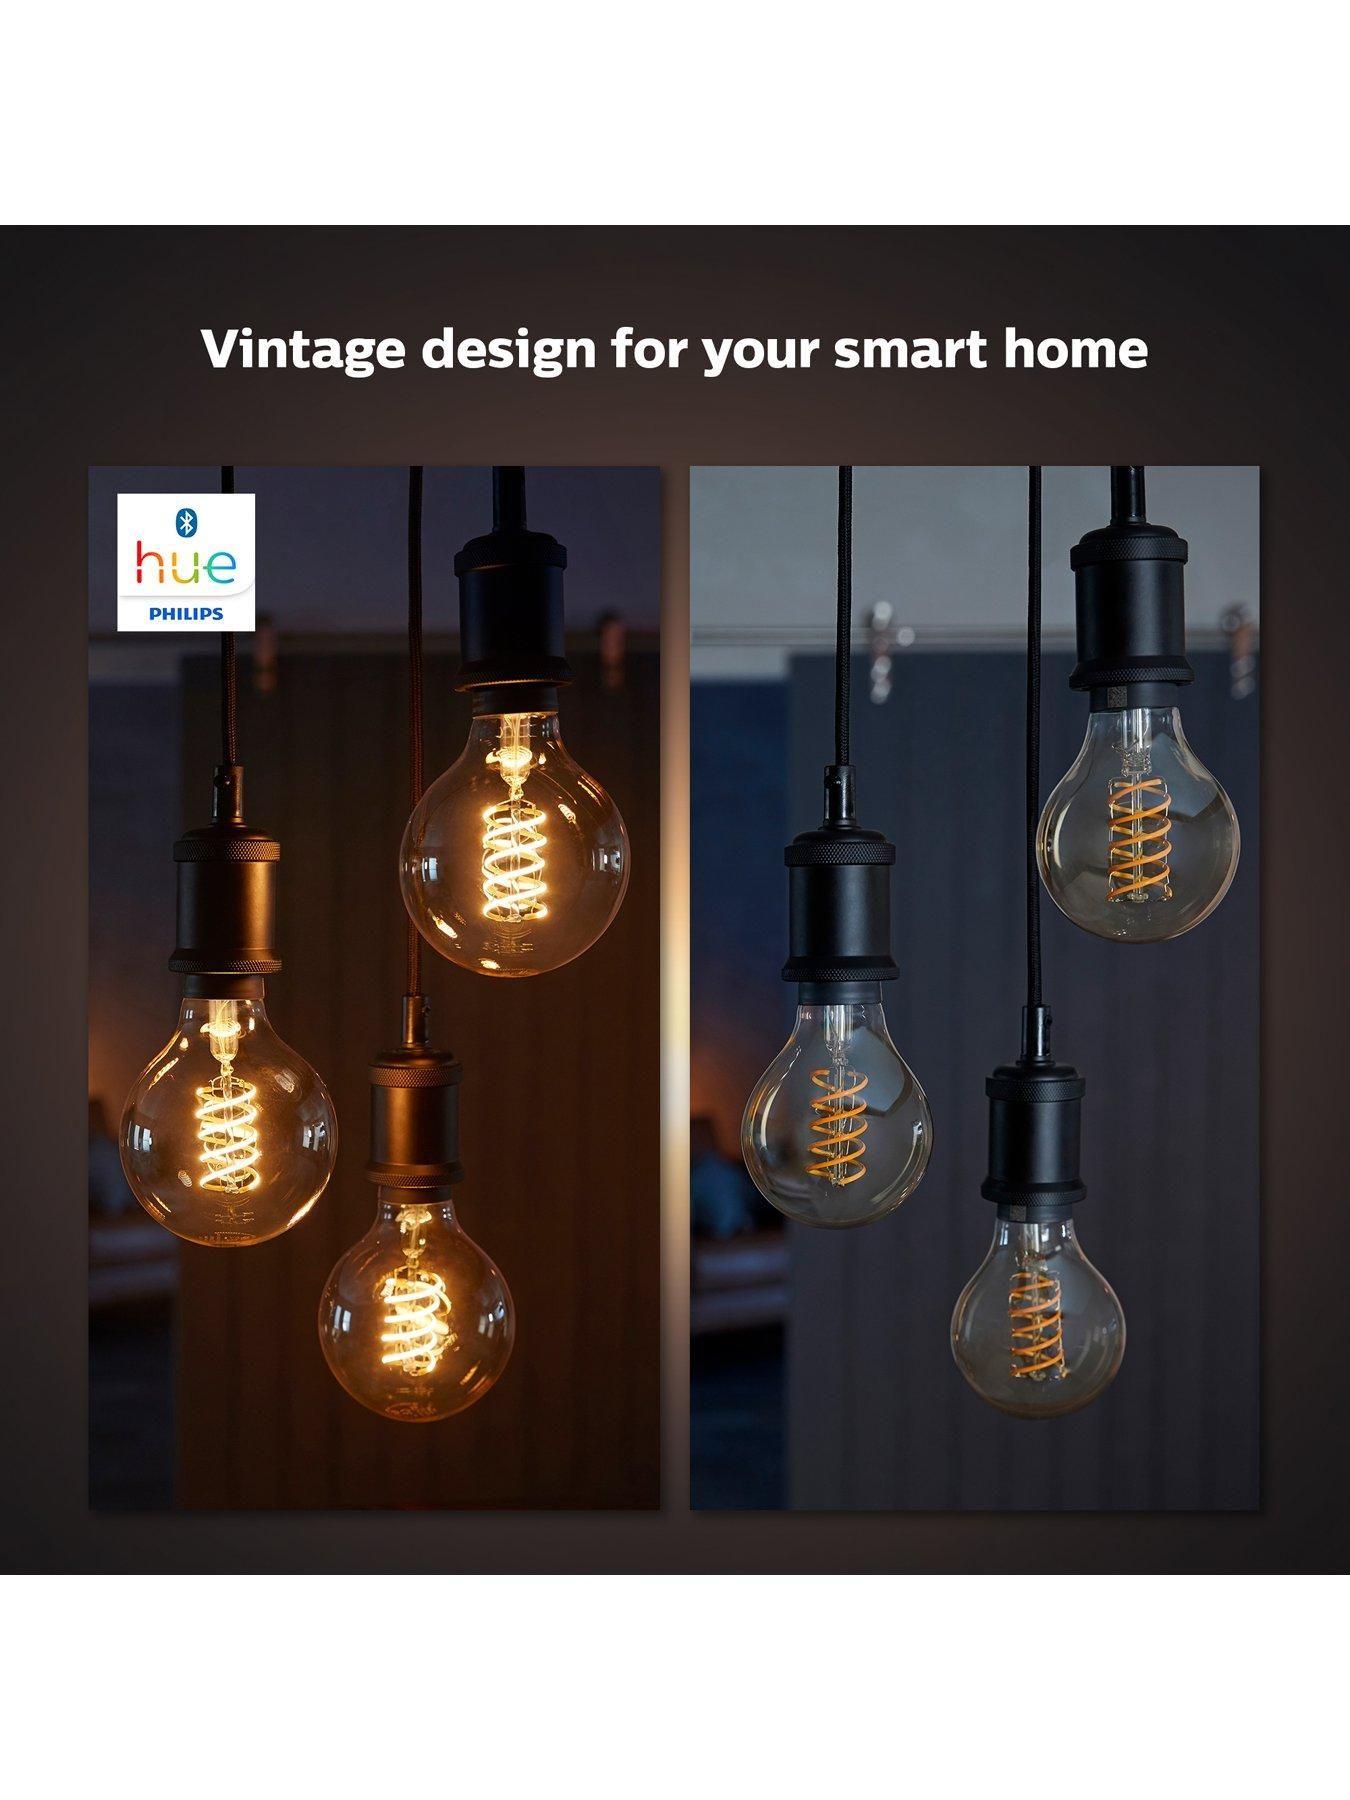 Hue White Filament Single Smart LED Globe [E27] with